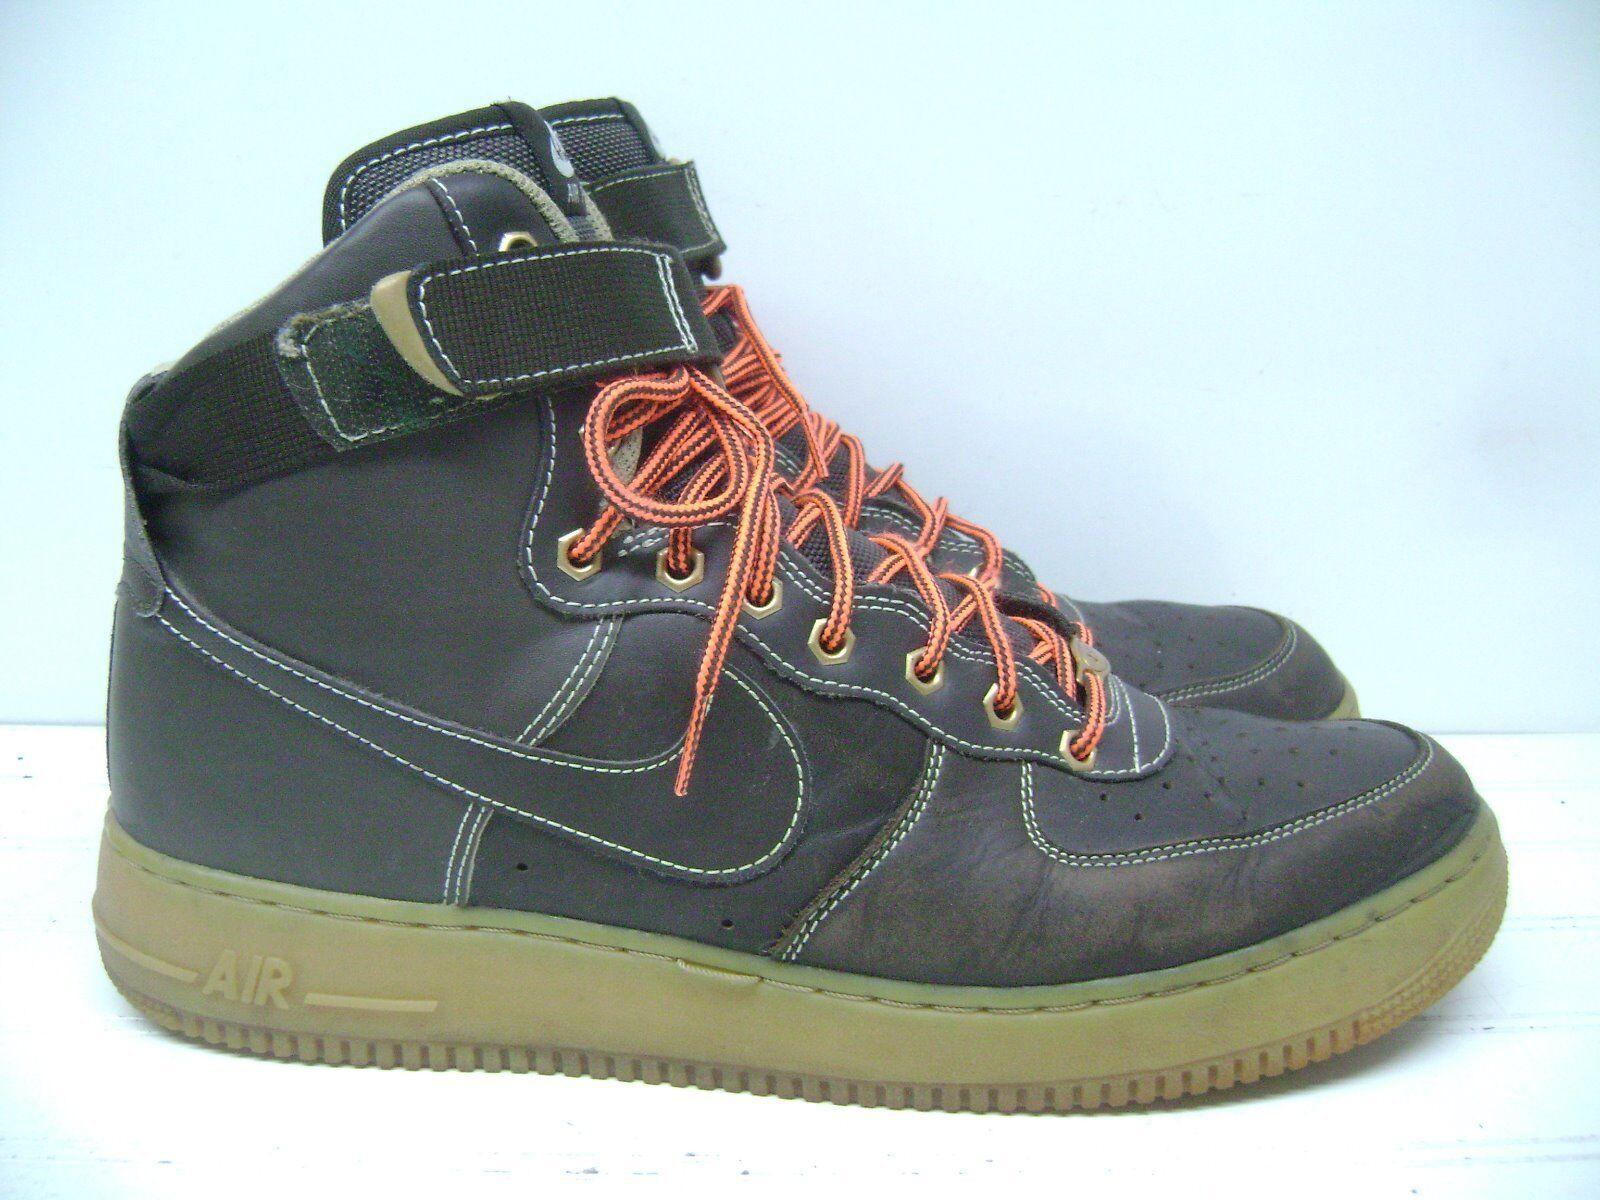 Nike air force 1 af1 alto barocco brown gomma solo uomini scarpe 13